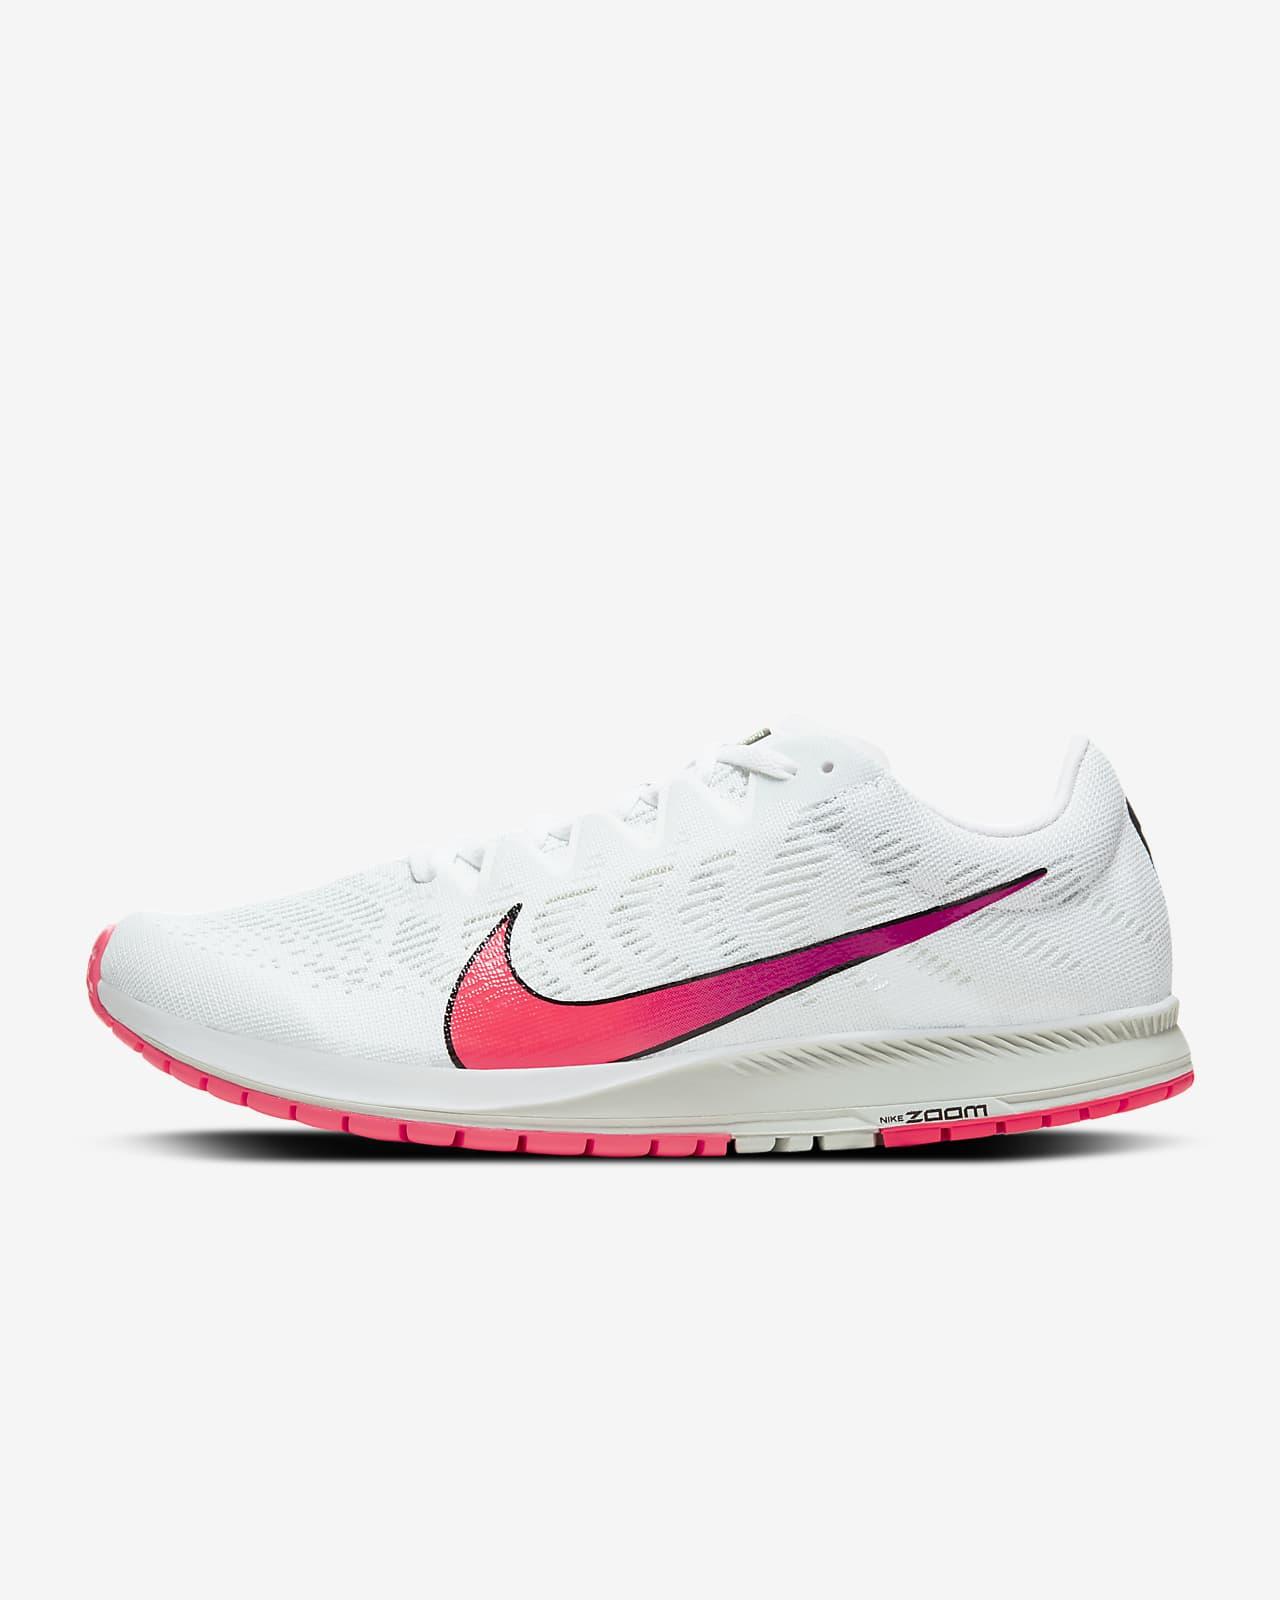 Aceptado béisbol enlace  Calzado de running Nike Air Zoom Streak 7. Nike.com